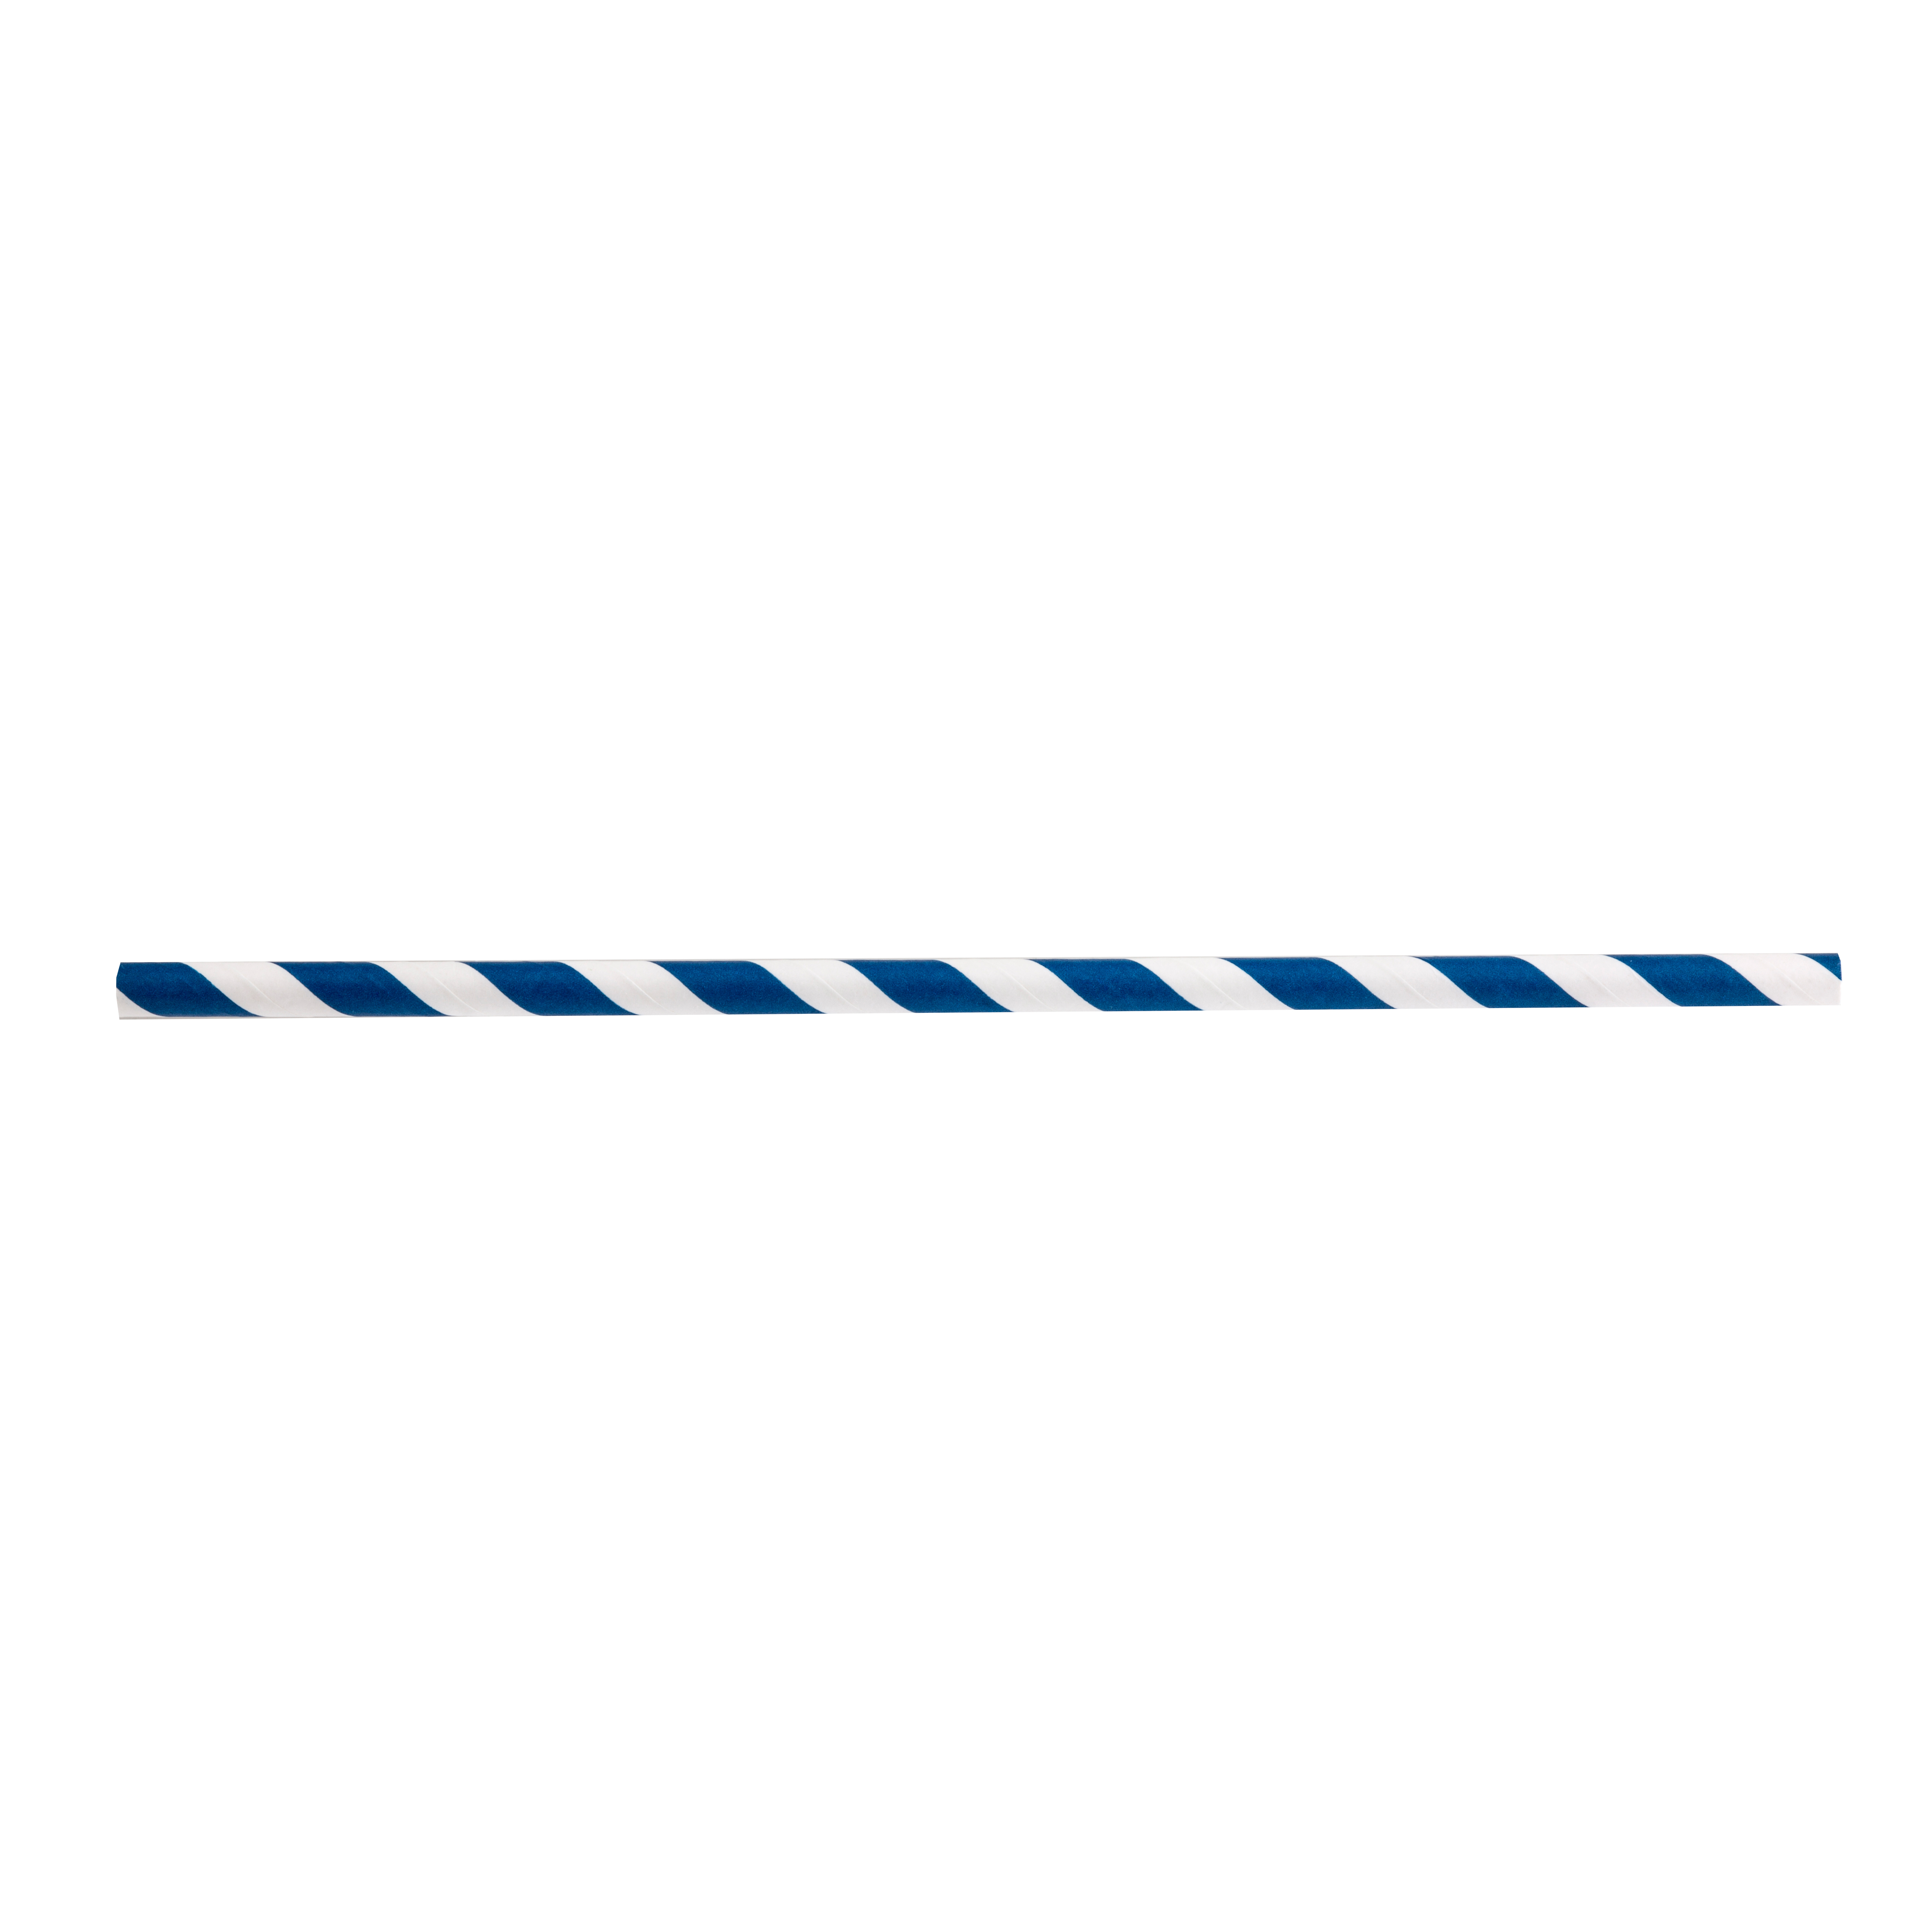 TableCraft Products 700123 straws